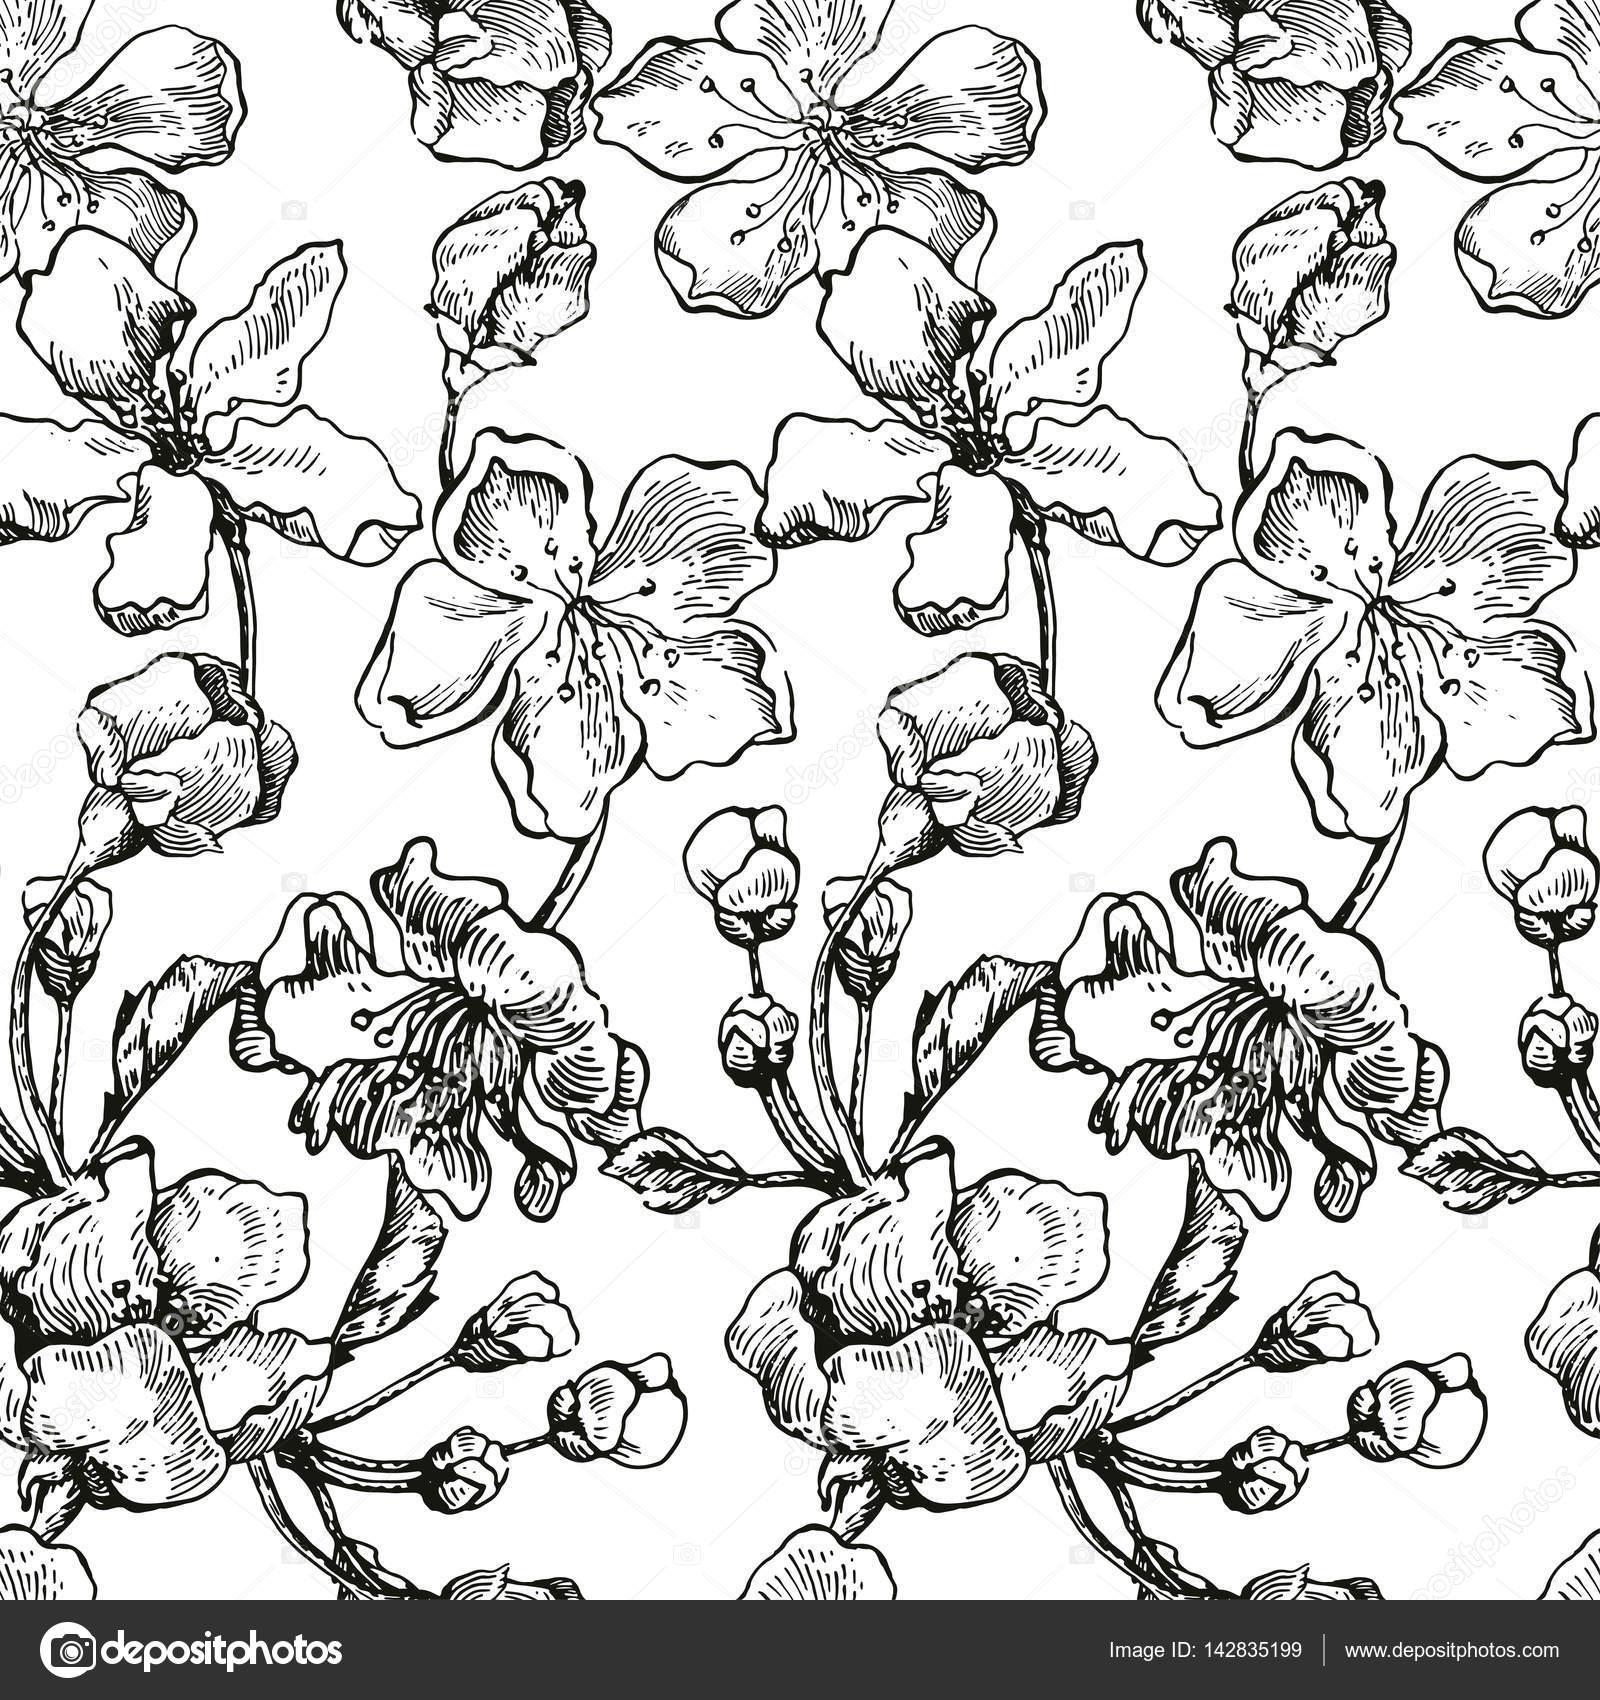 apple tree sketch design stock vector katyr 142835199 Apple Tree Leaves apple tree sketch design stock vector